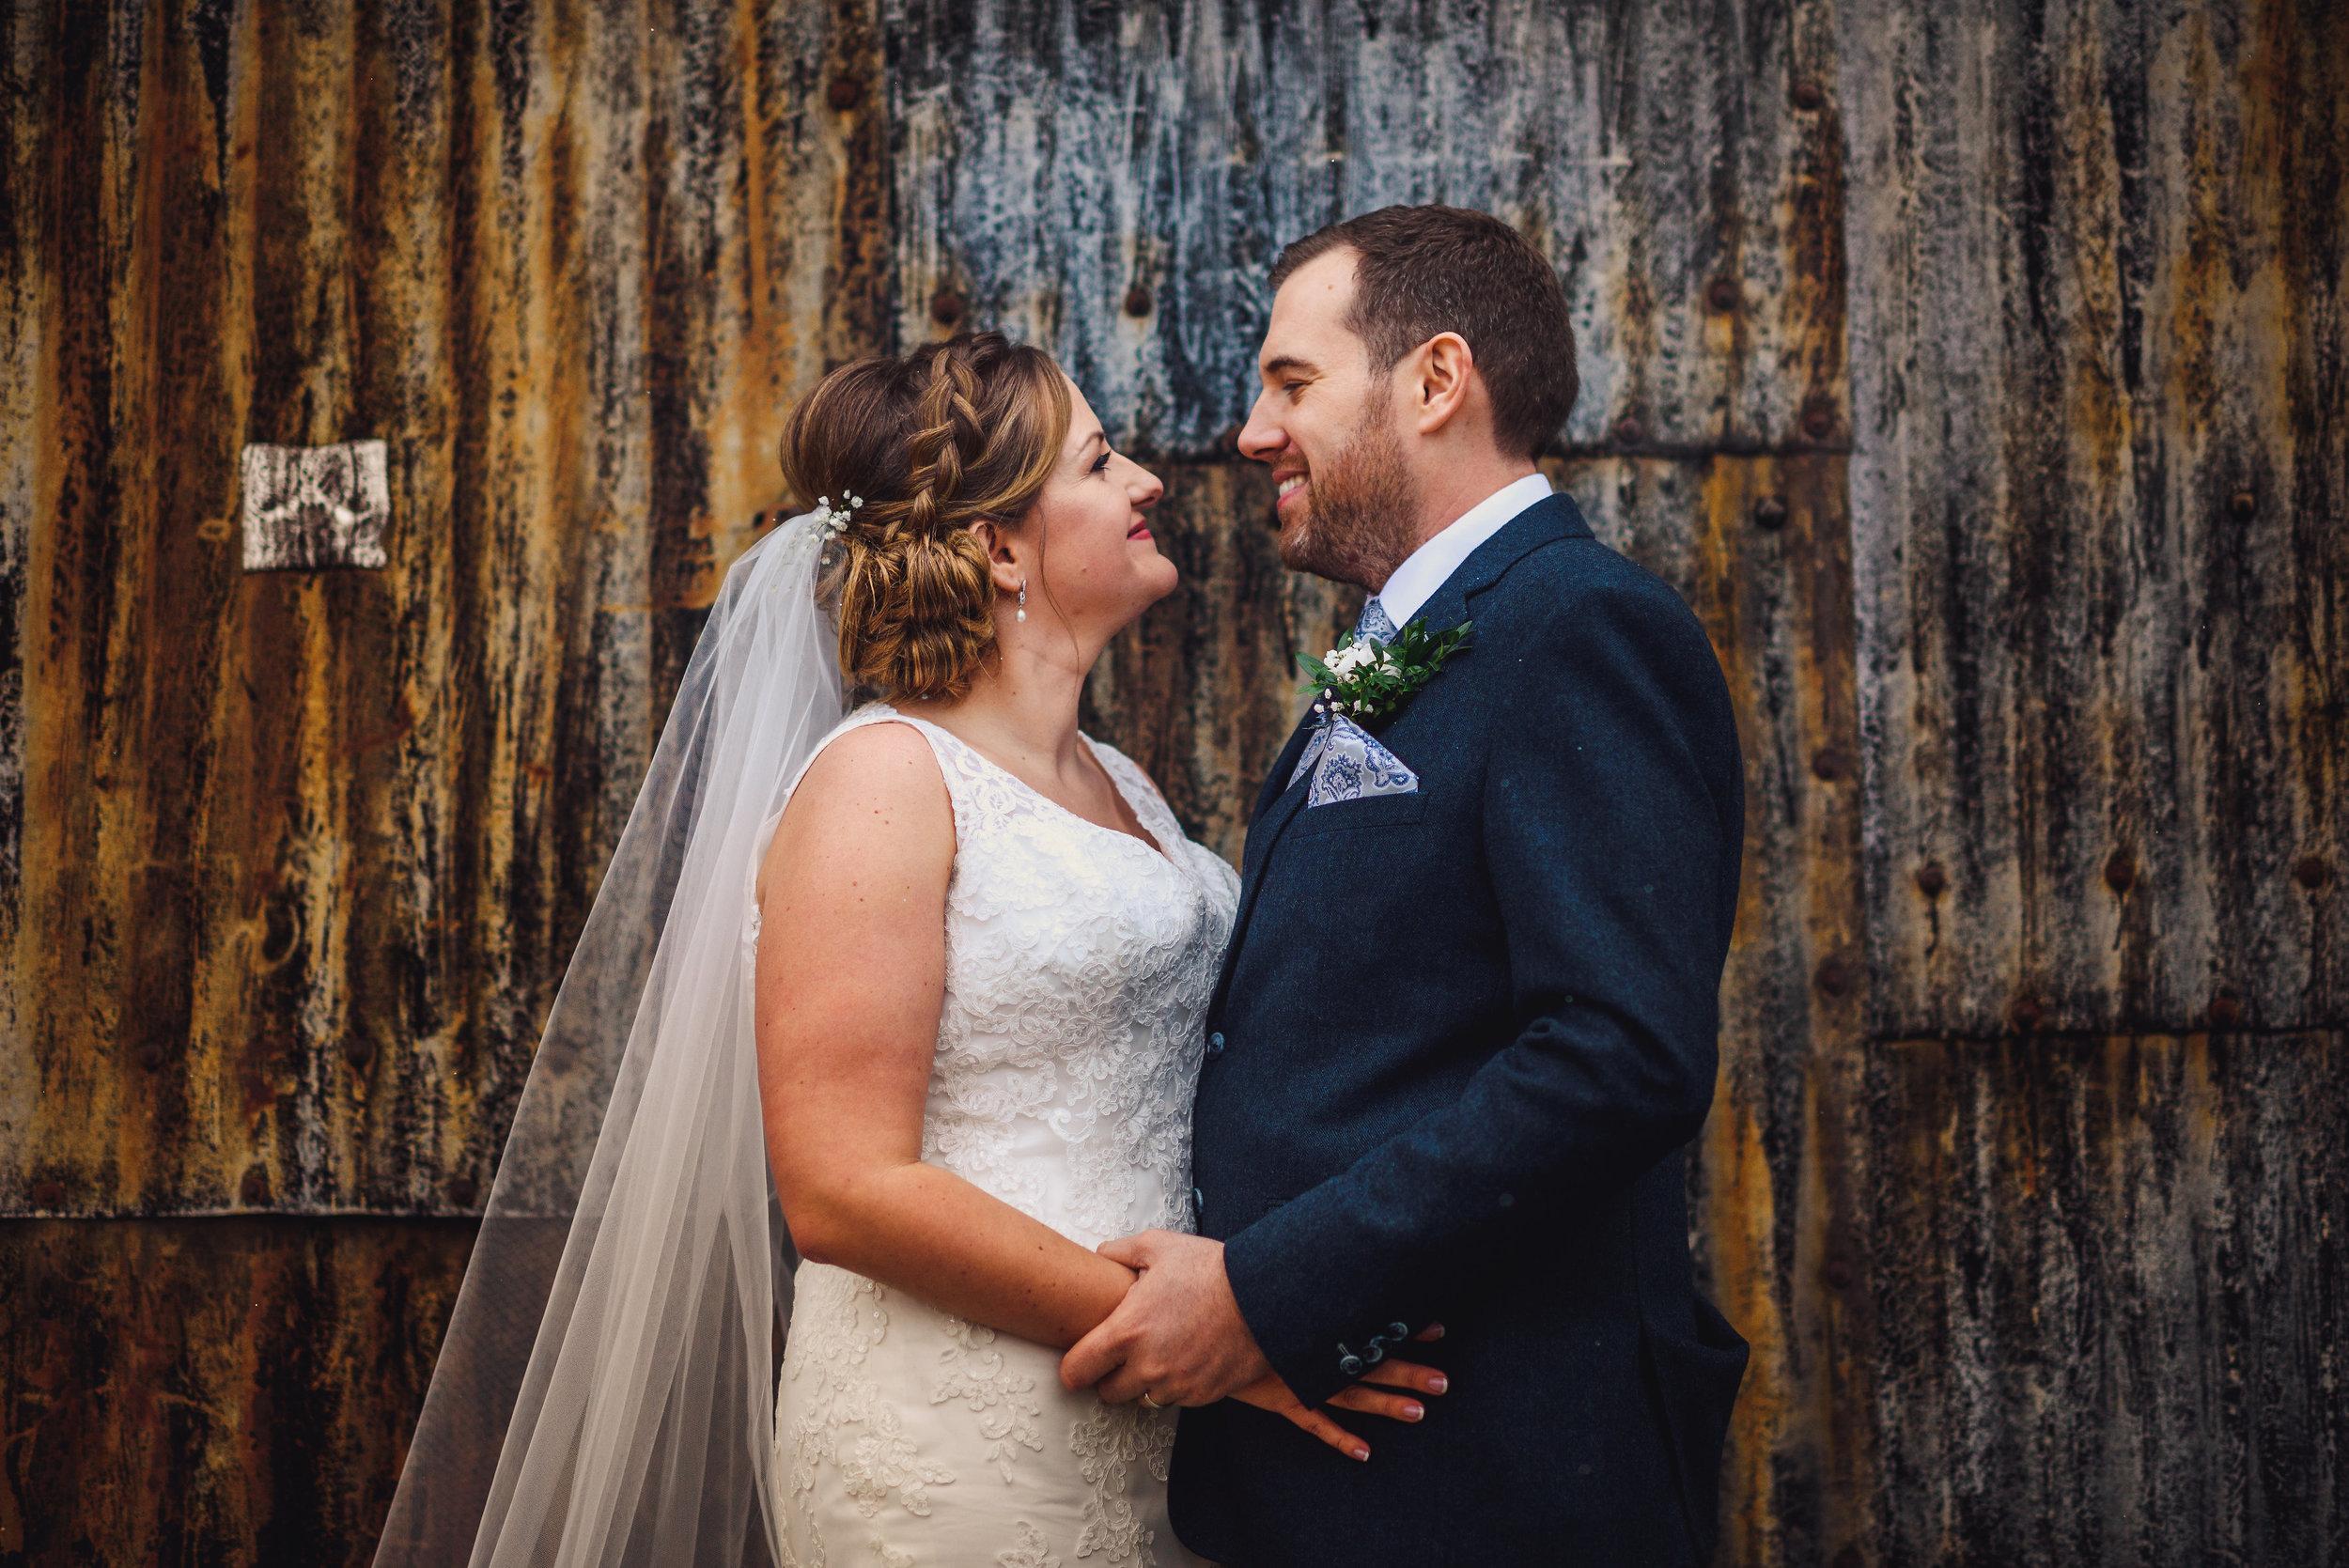 Wedding Photographer Dan Morris